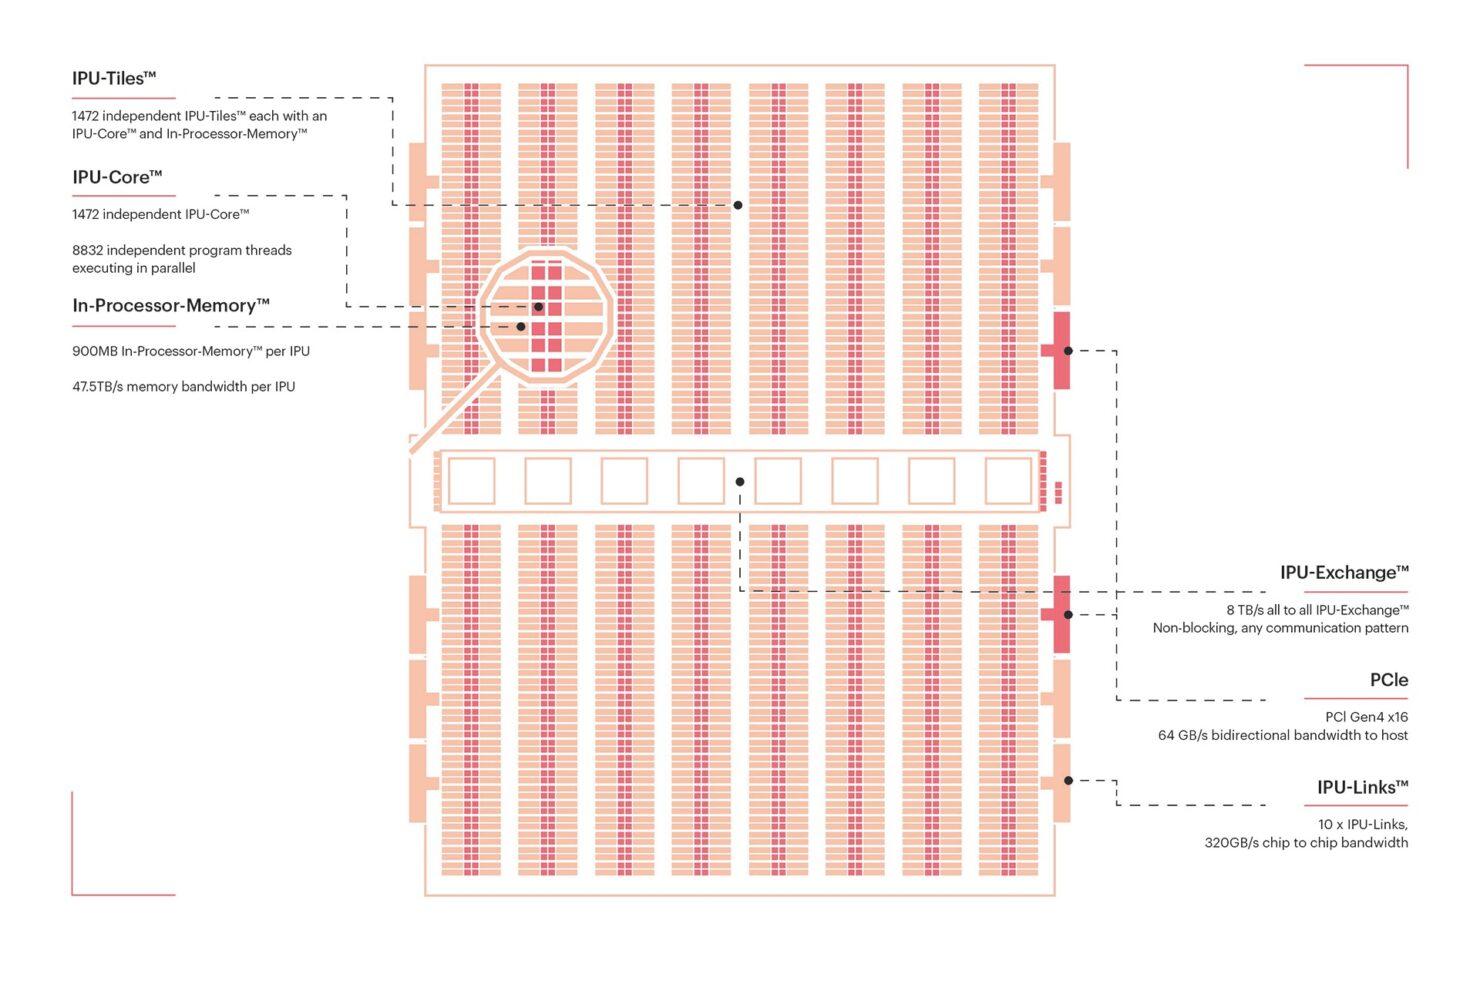 graphcore-colossus-mk2-gc200_ipu-m2000-server_chip_4